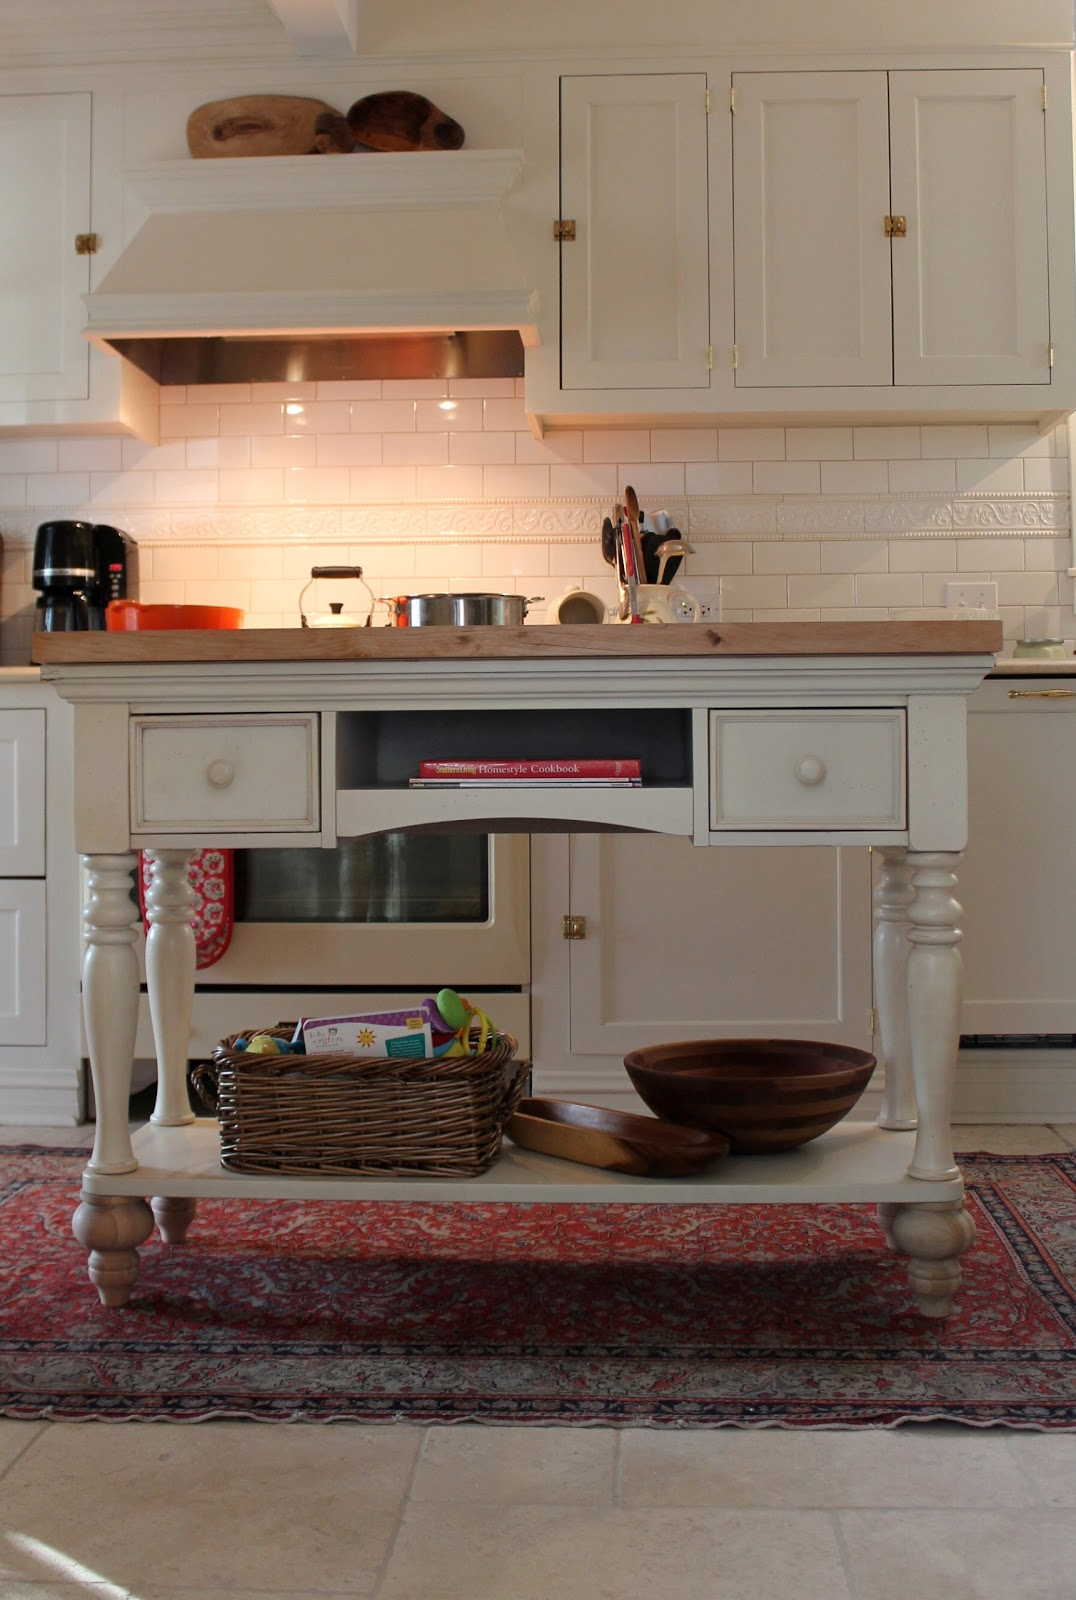 Building A Kitchen Island: Designing Domesticity: DIY Kitchen Island